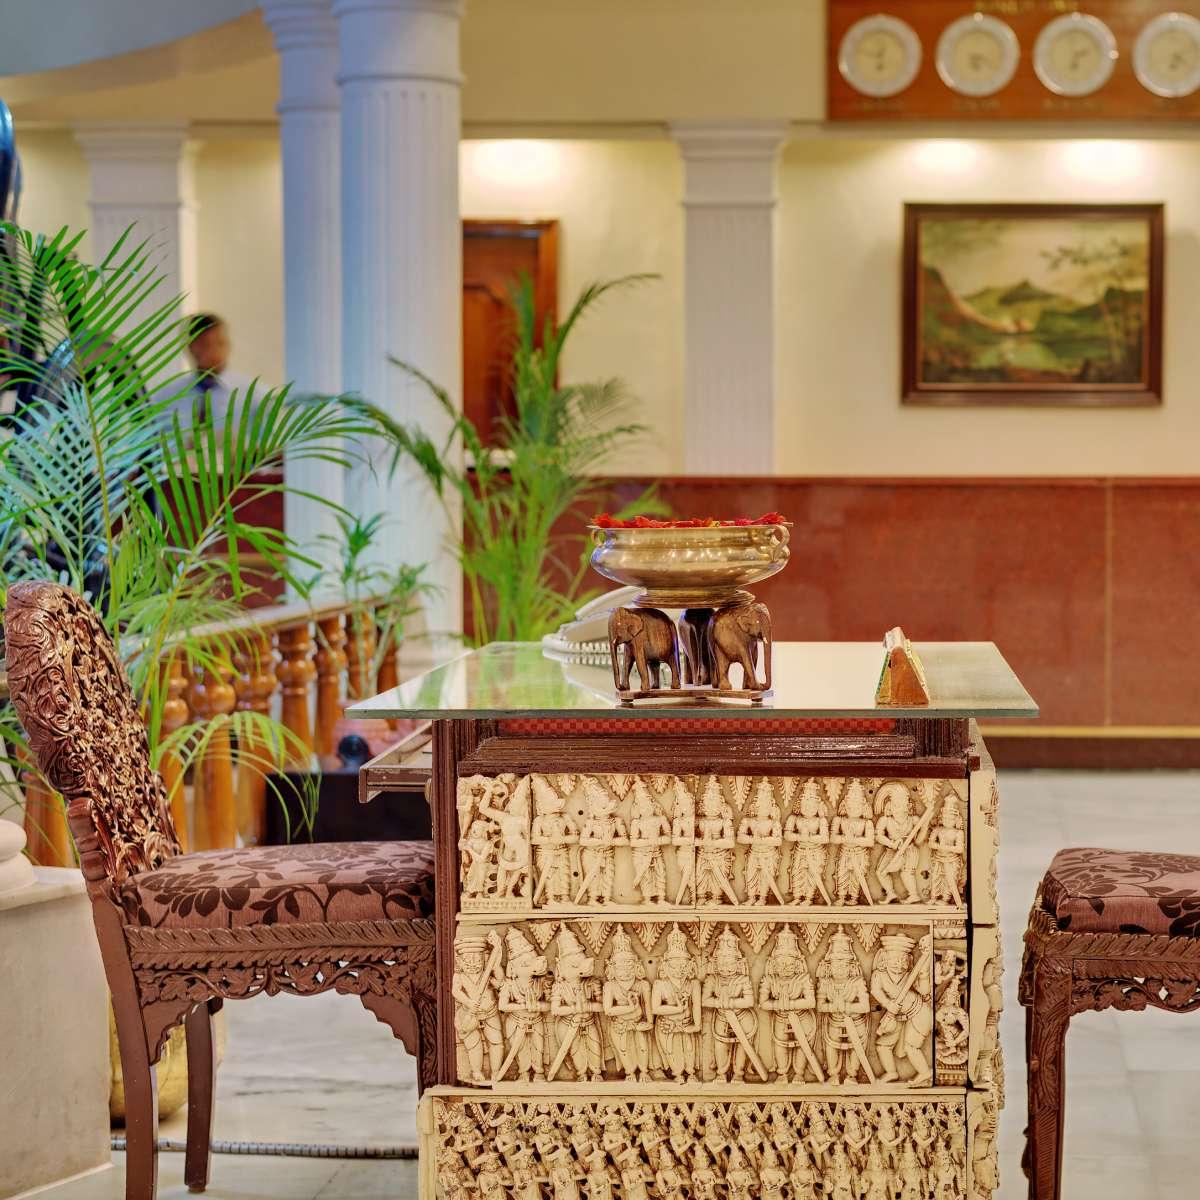 chennai reception square - The Ambassador | Heritage Hotels in Mumbai, Aurangabad, Chennai - Careers